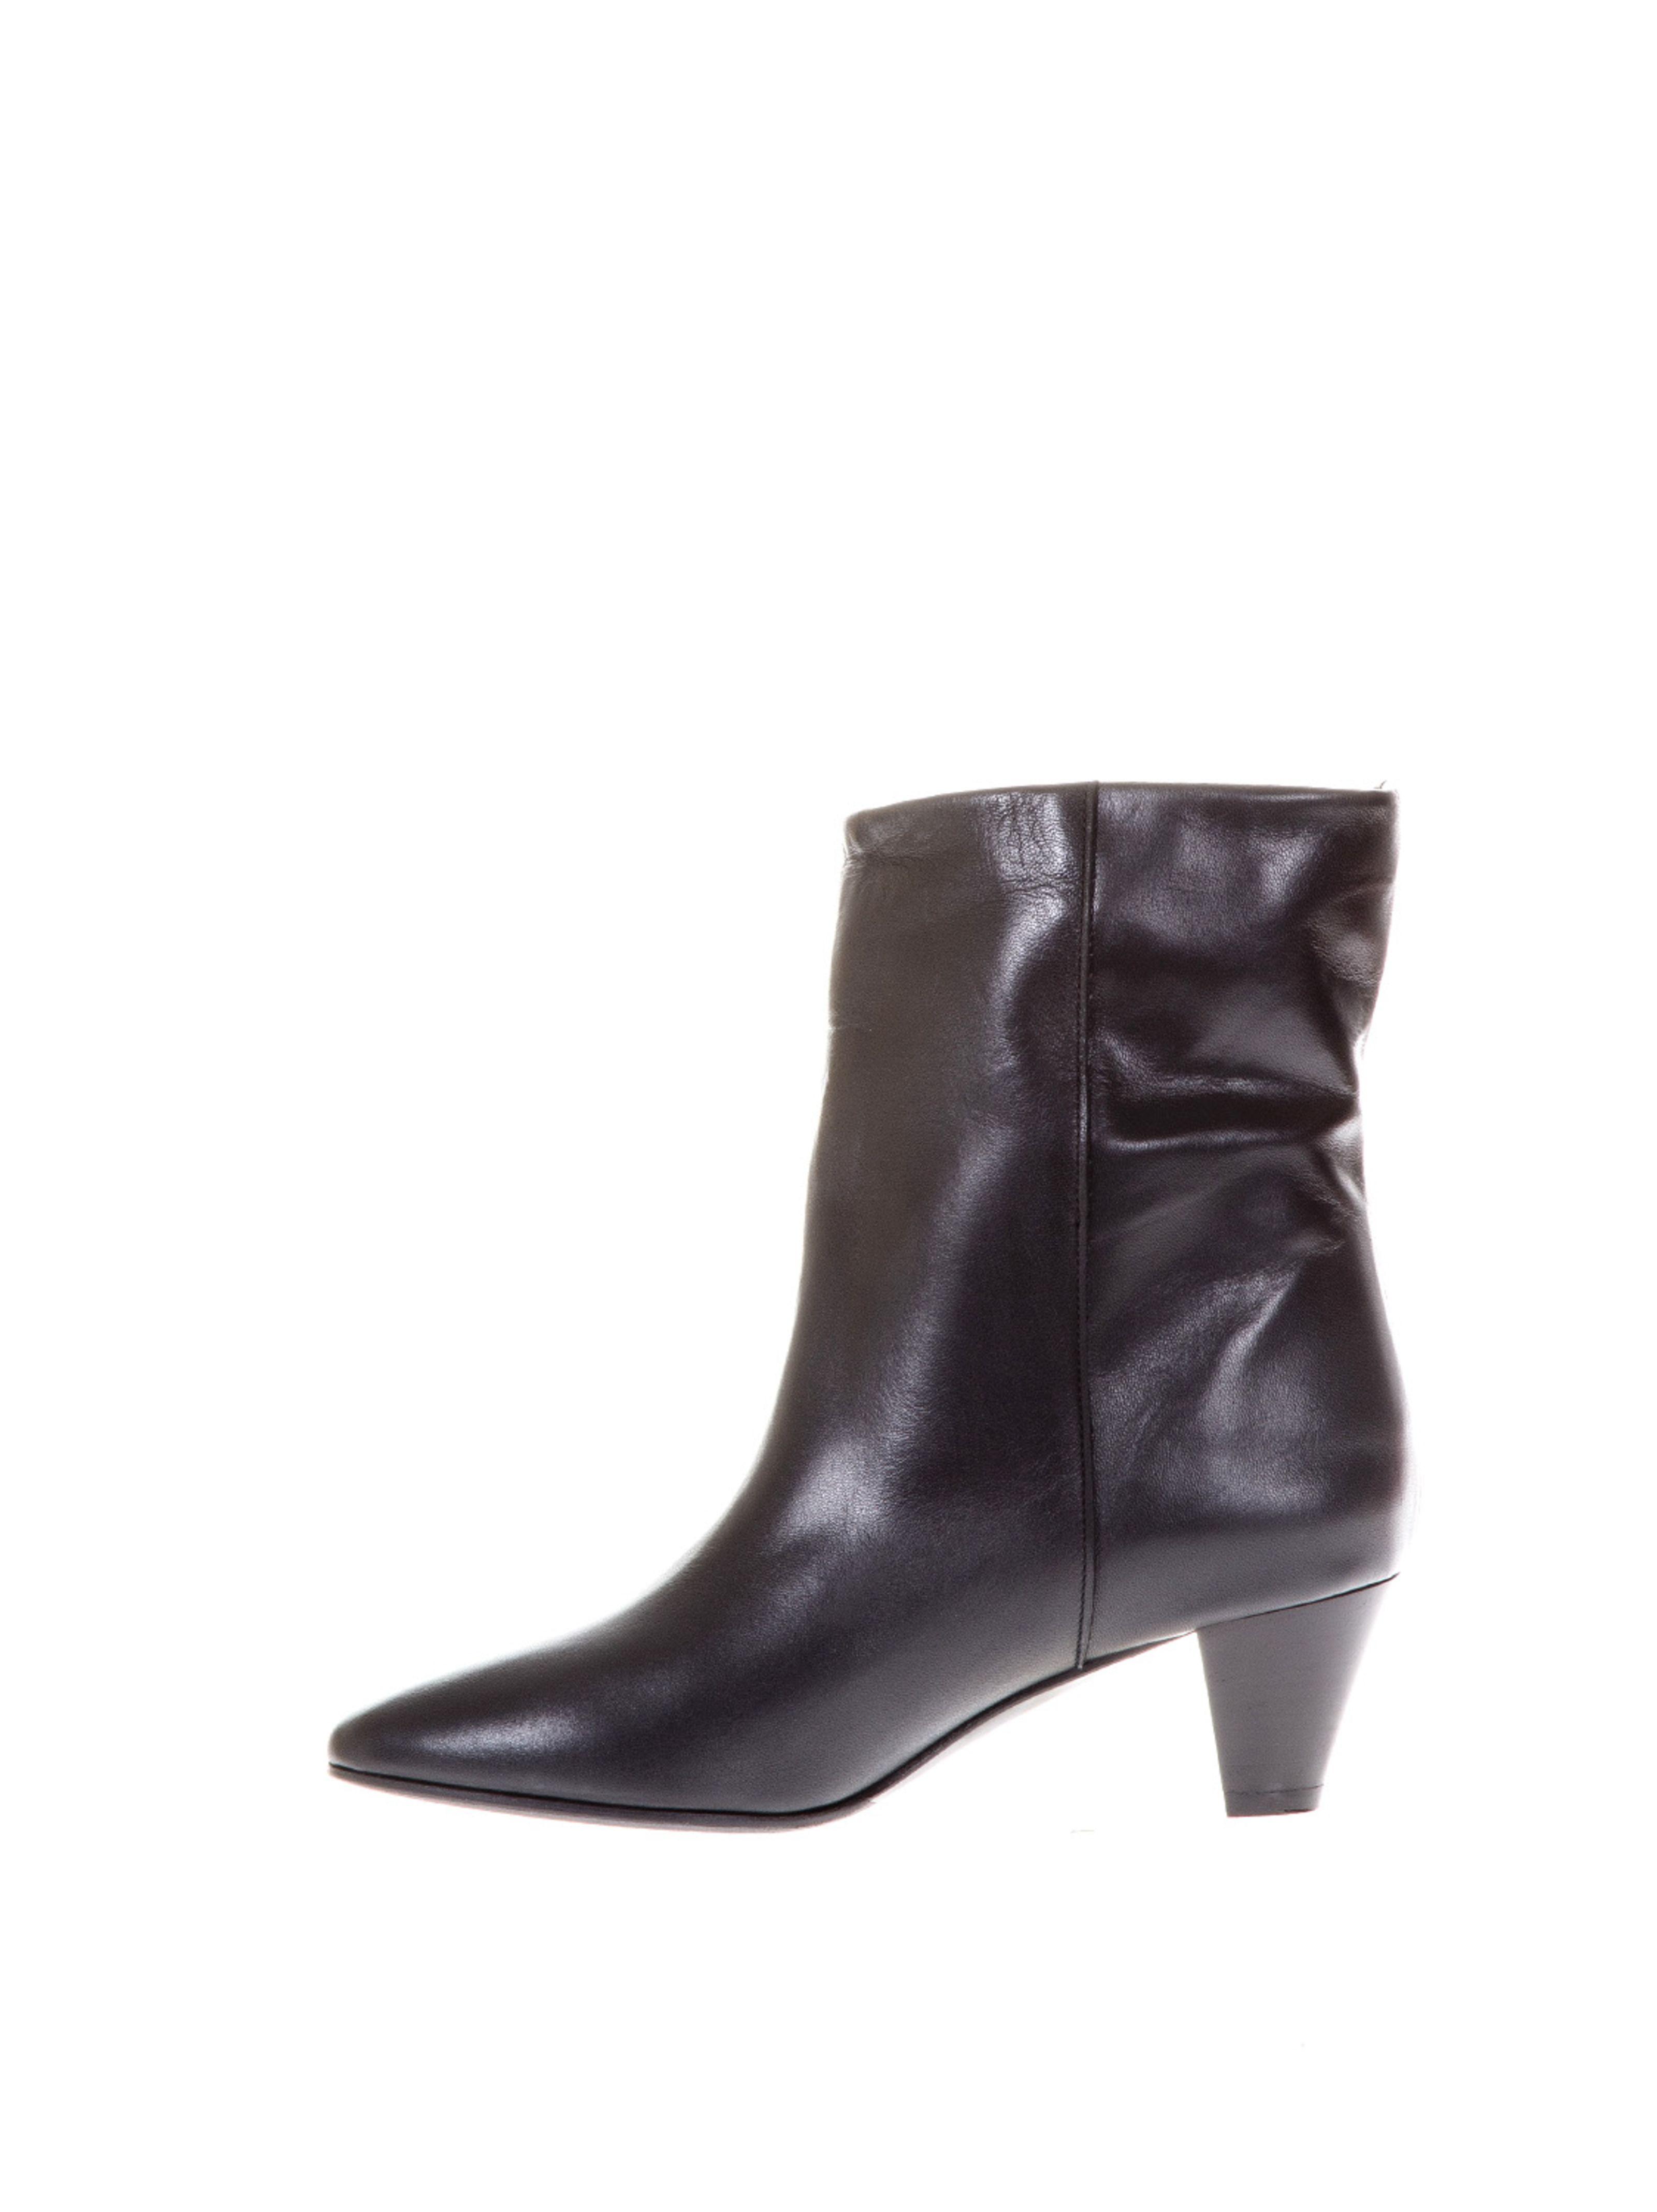 heeled leather boots - Black Marc Ellis fV5oohSbP